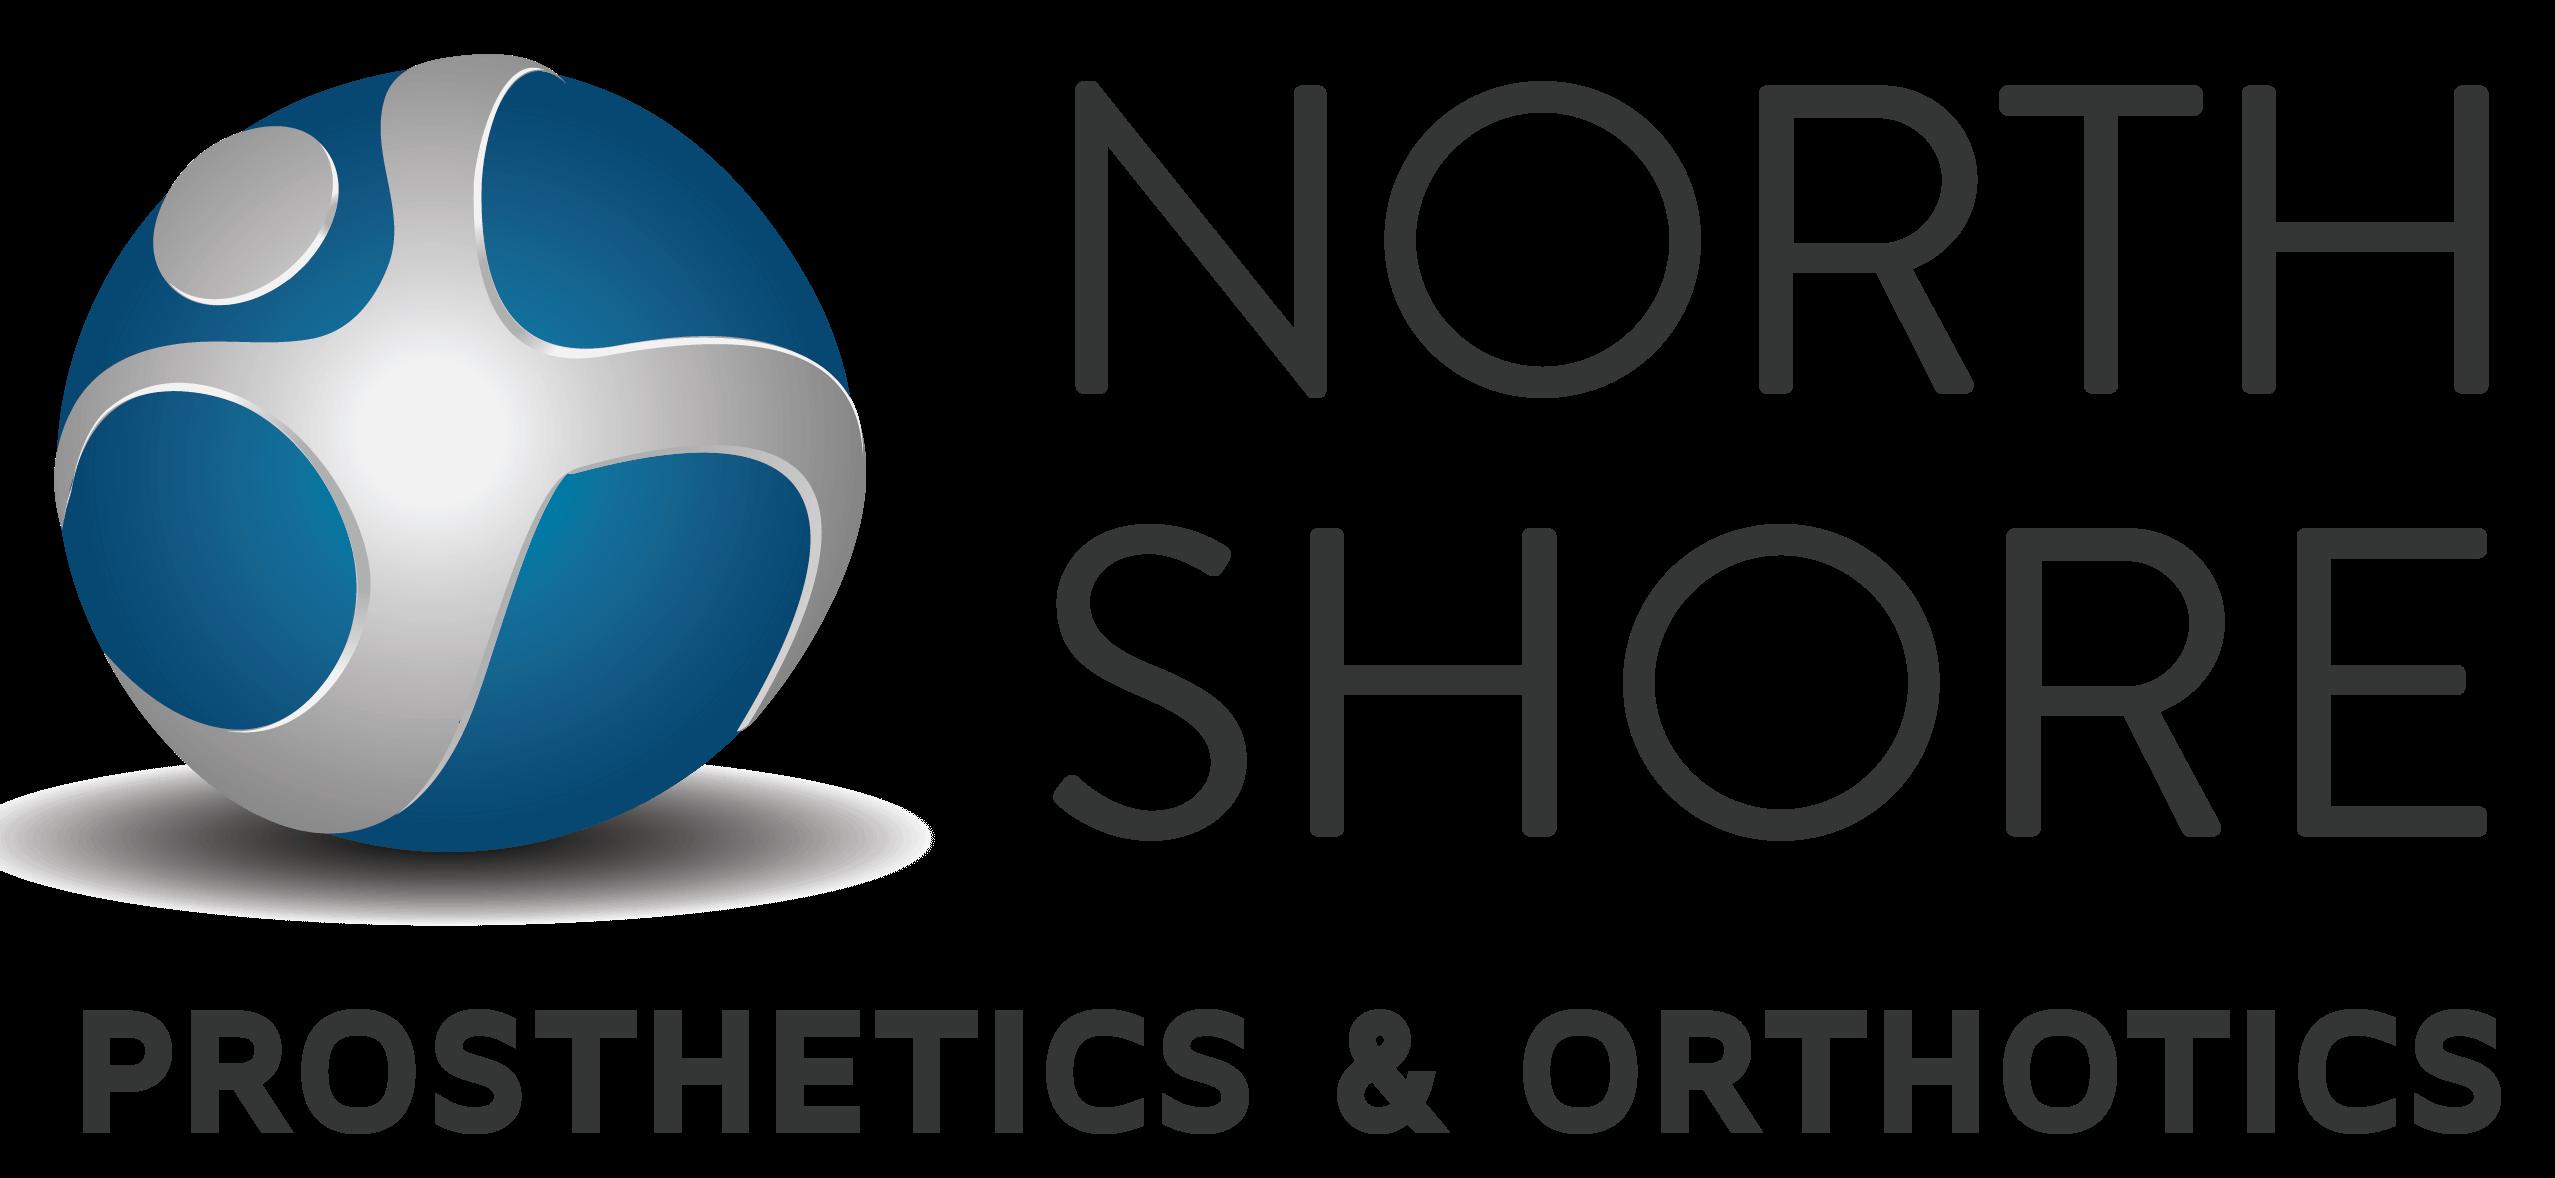 north shore prosthetics and orthotics